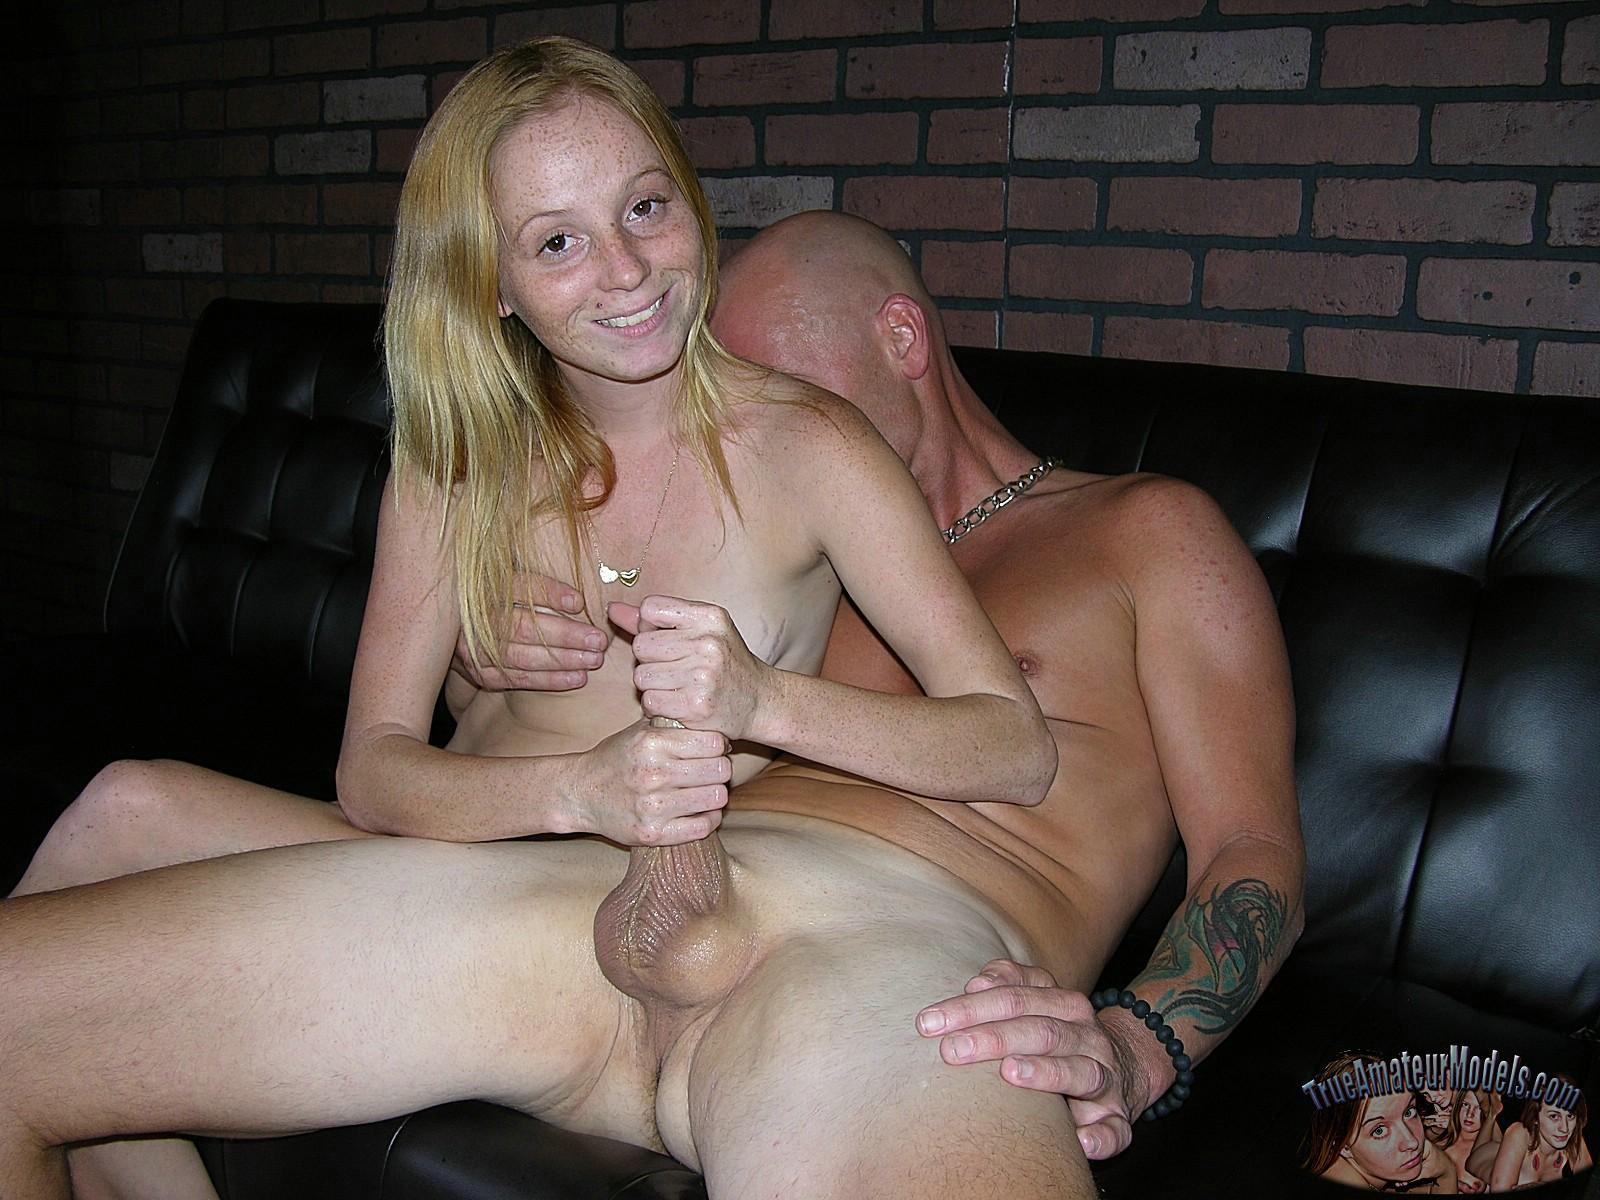 bbw supersize girl naked